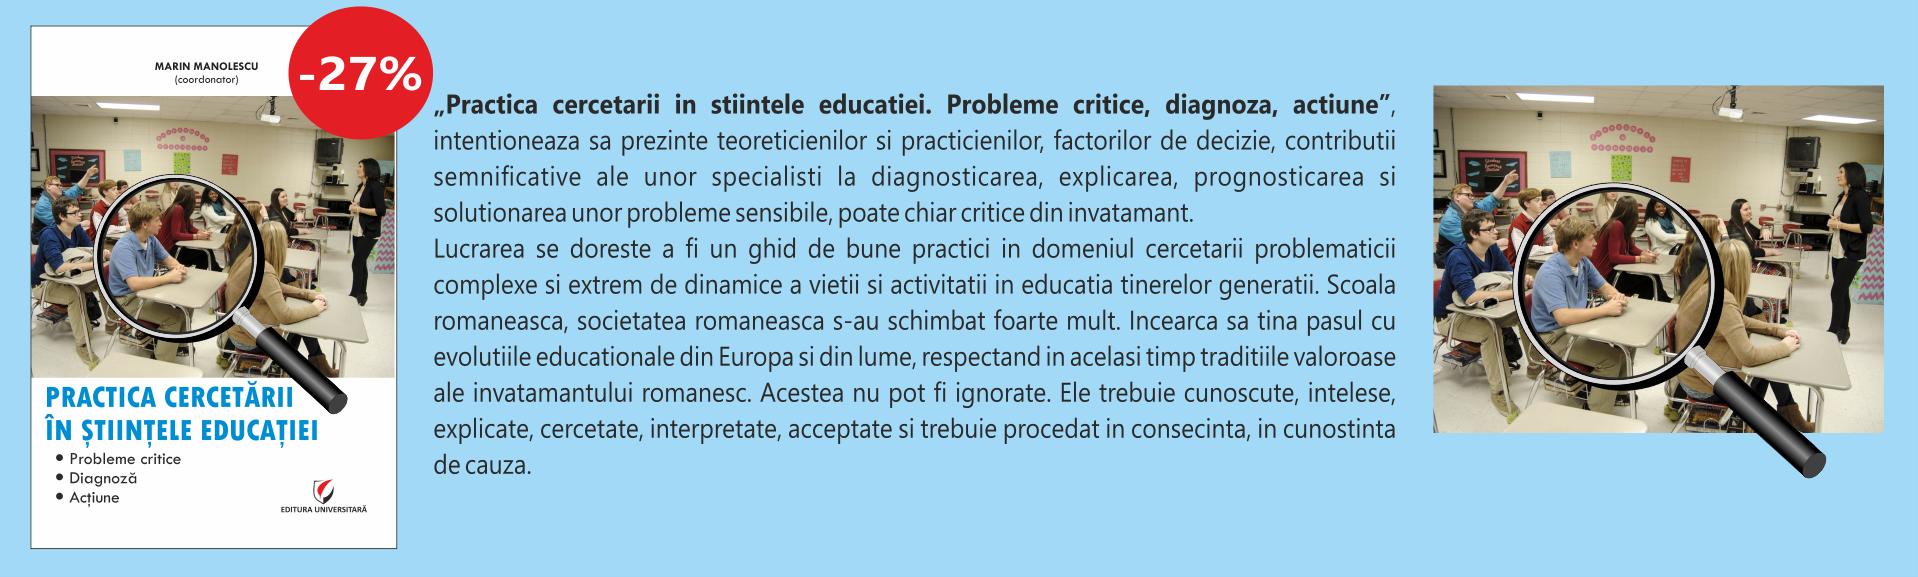 Homepage_6_Practica cercetarii